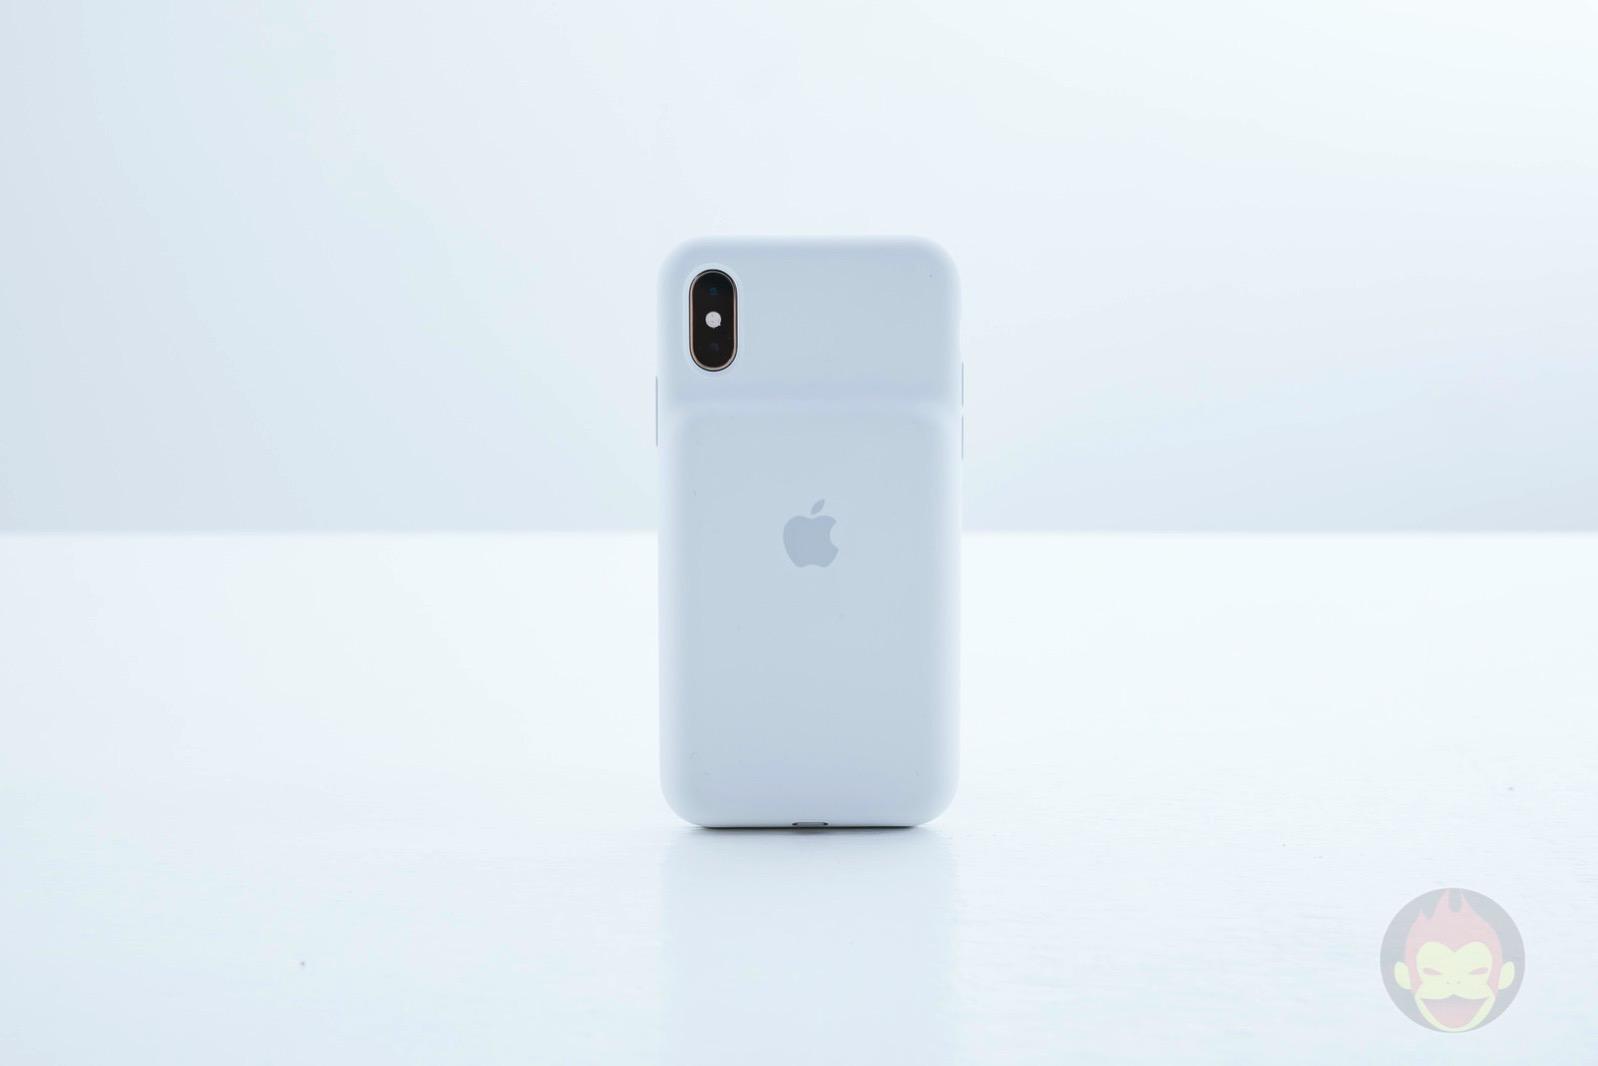 Smart-Battery-Case-for-iPhoneXS-Review-09.jpg